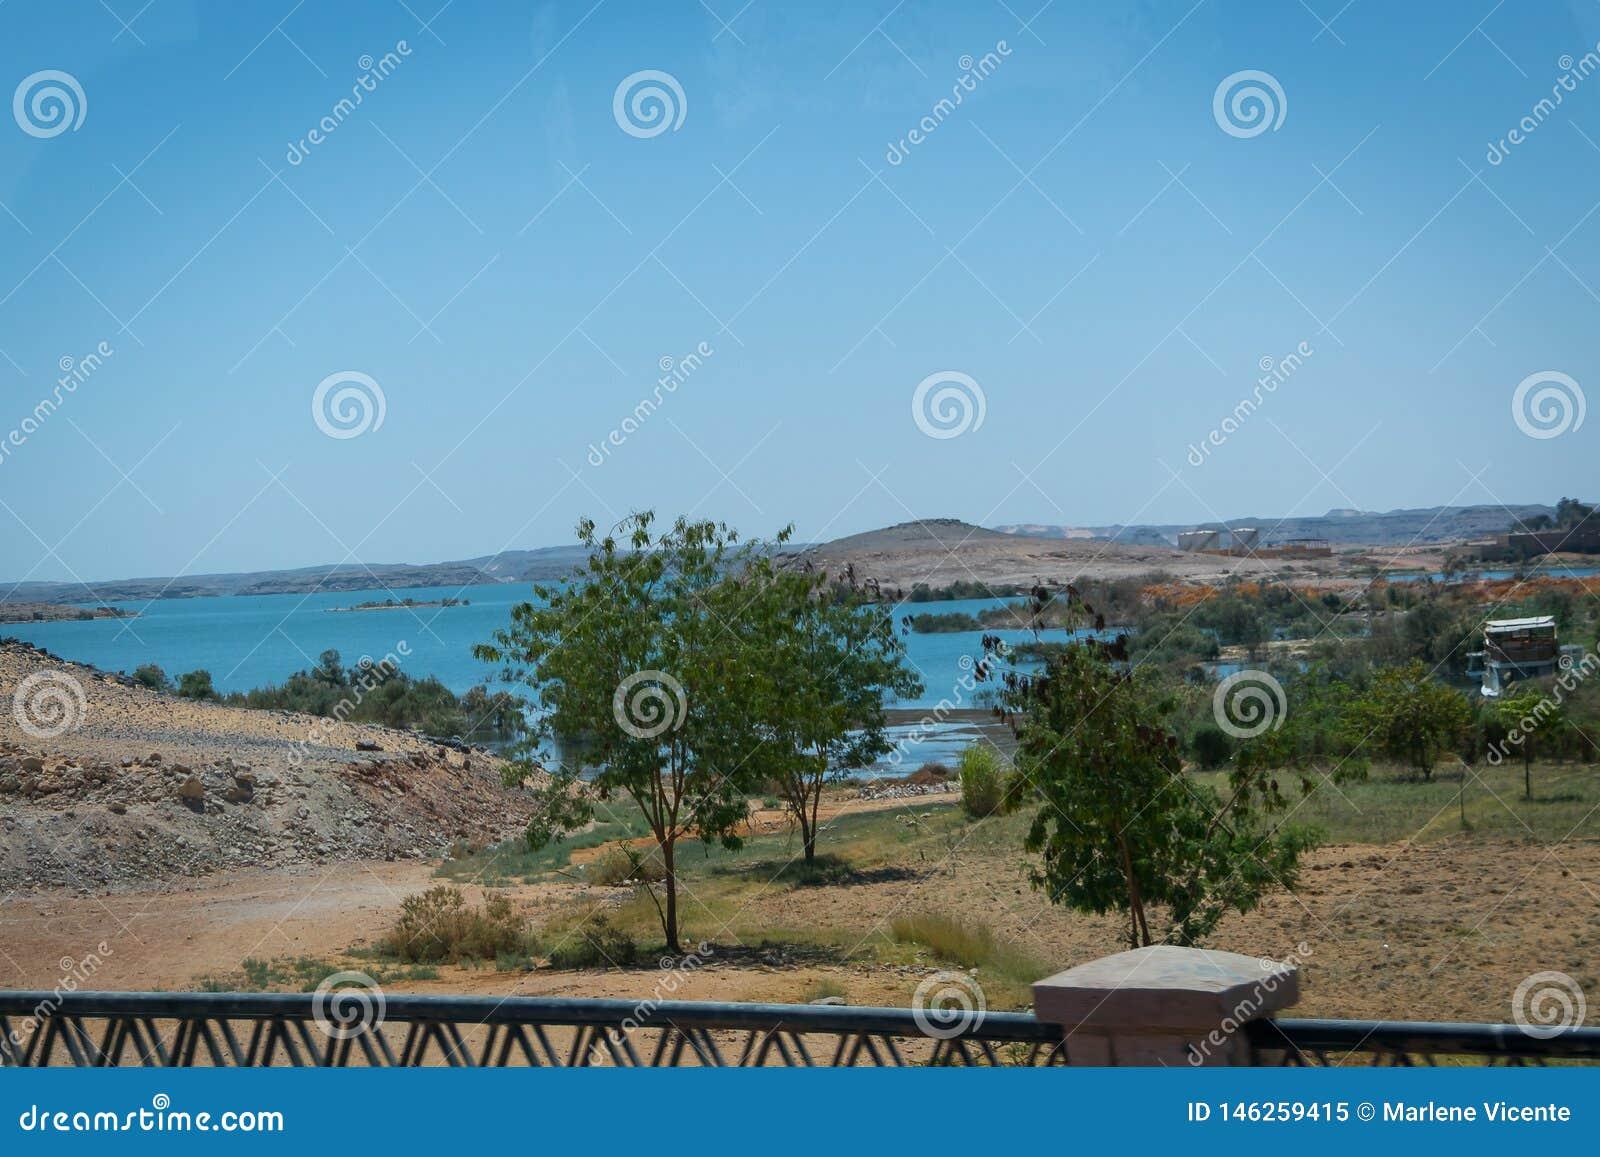 E Озеро Nasser рядом с виском Abu Simbel